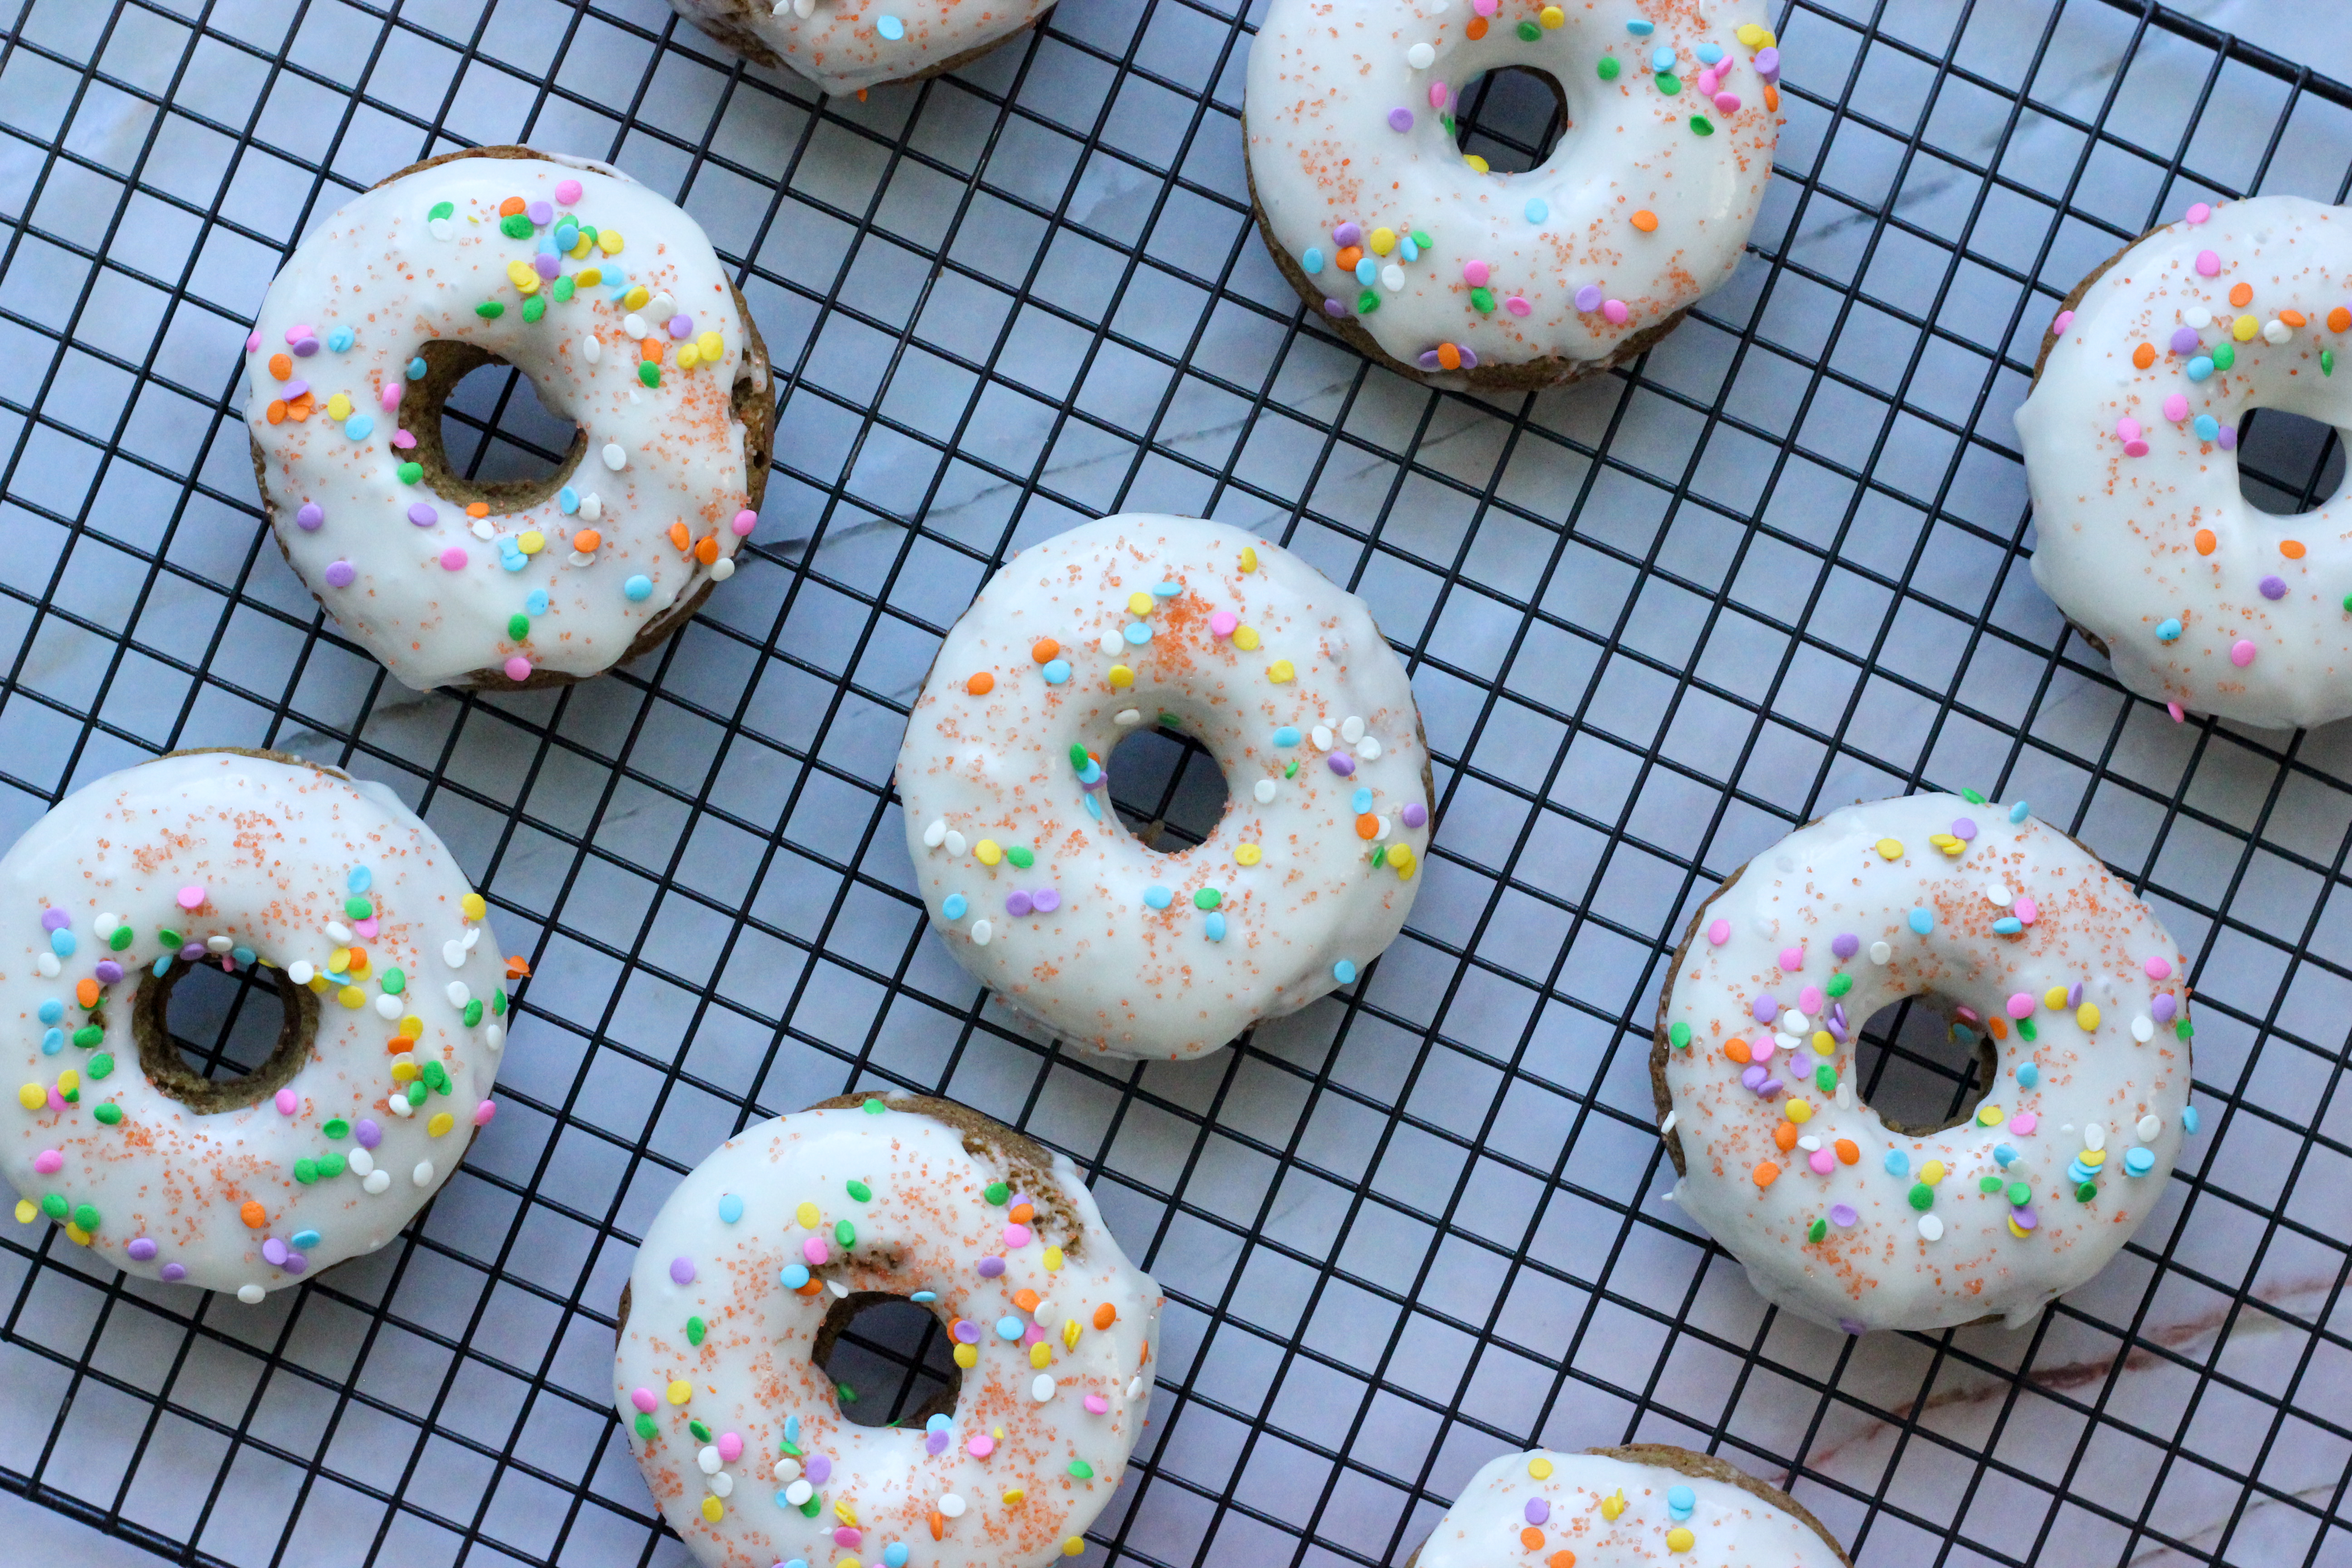 Gluten-Free Carrot Cake Doughnuts